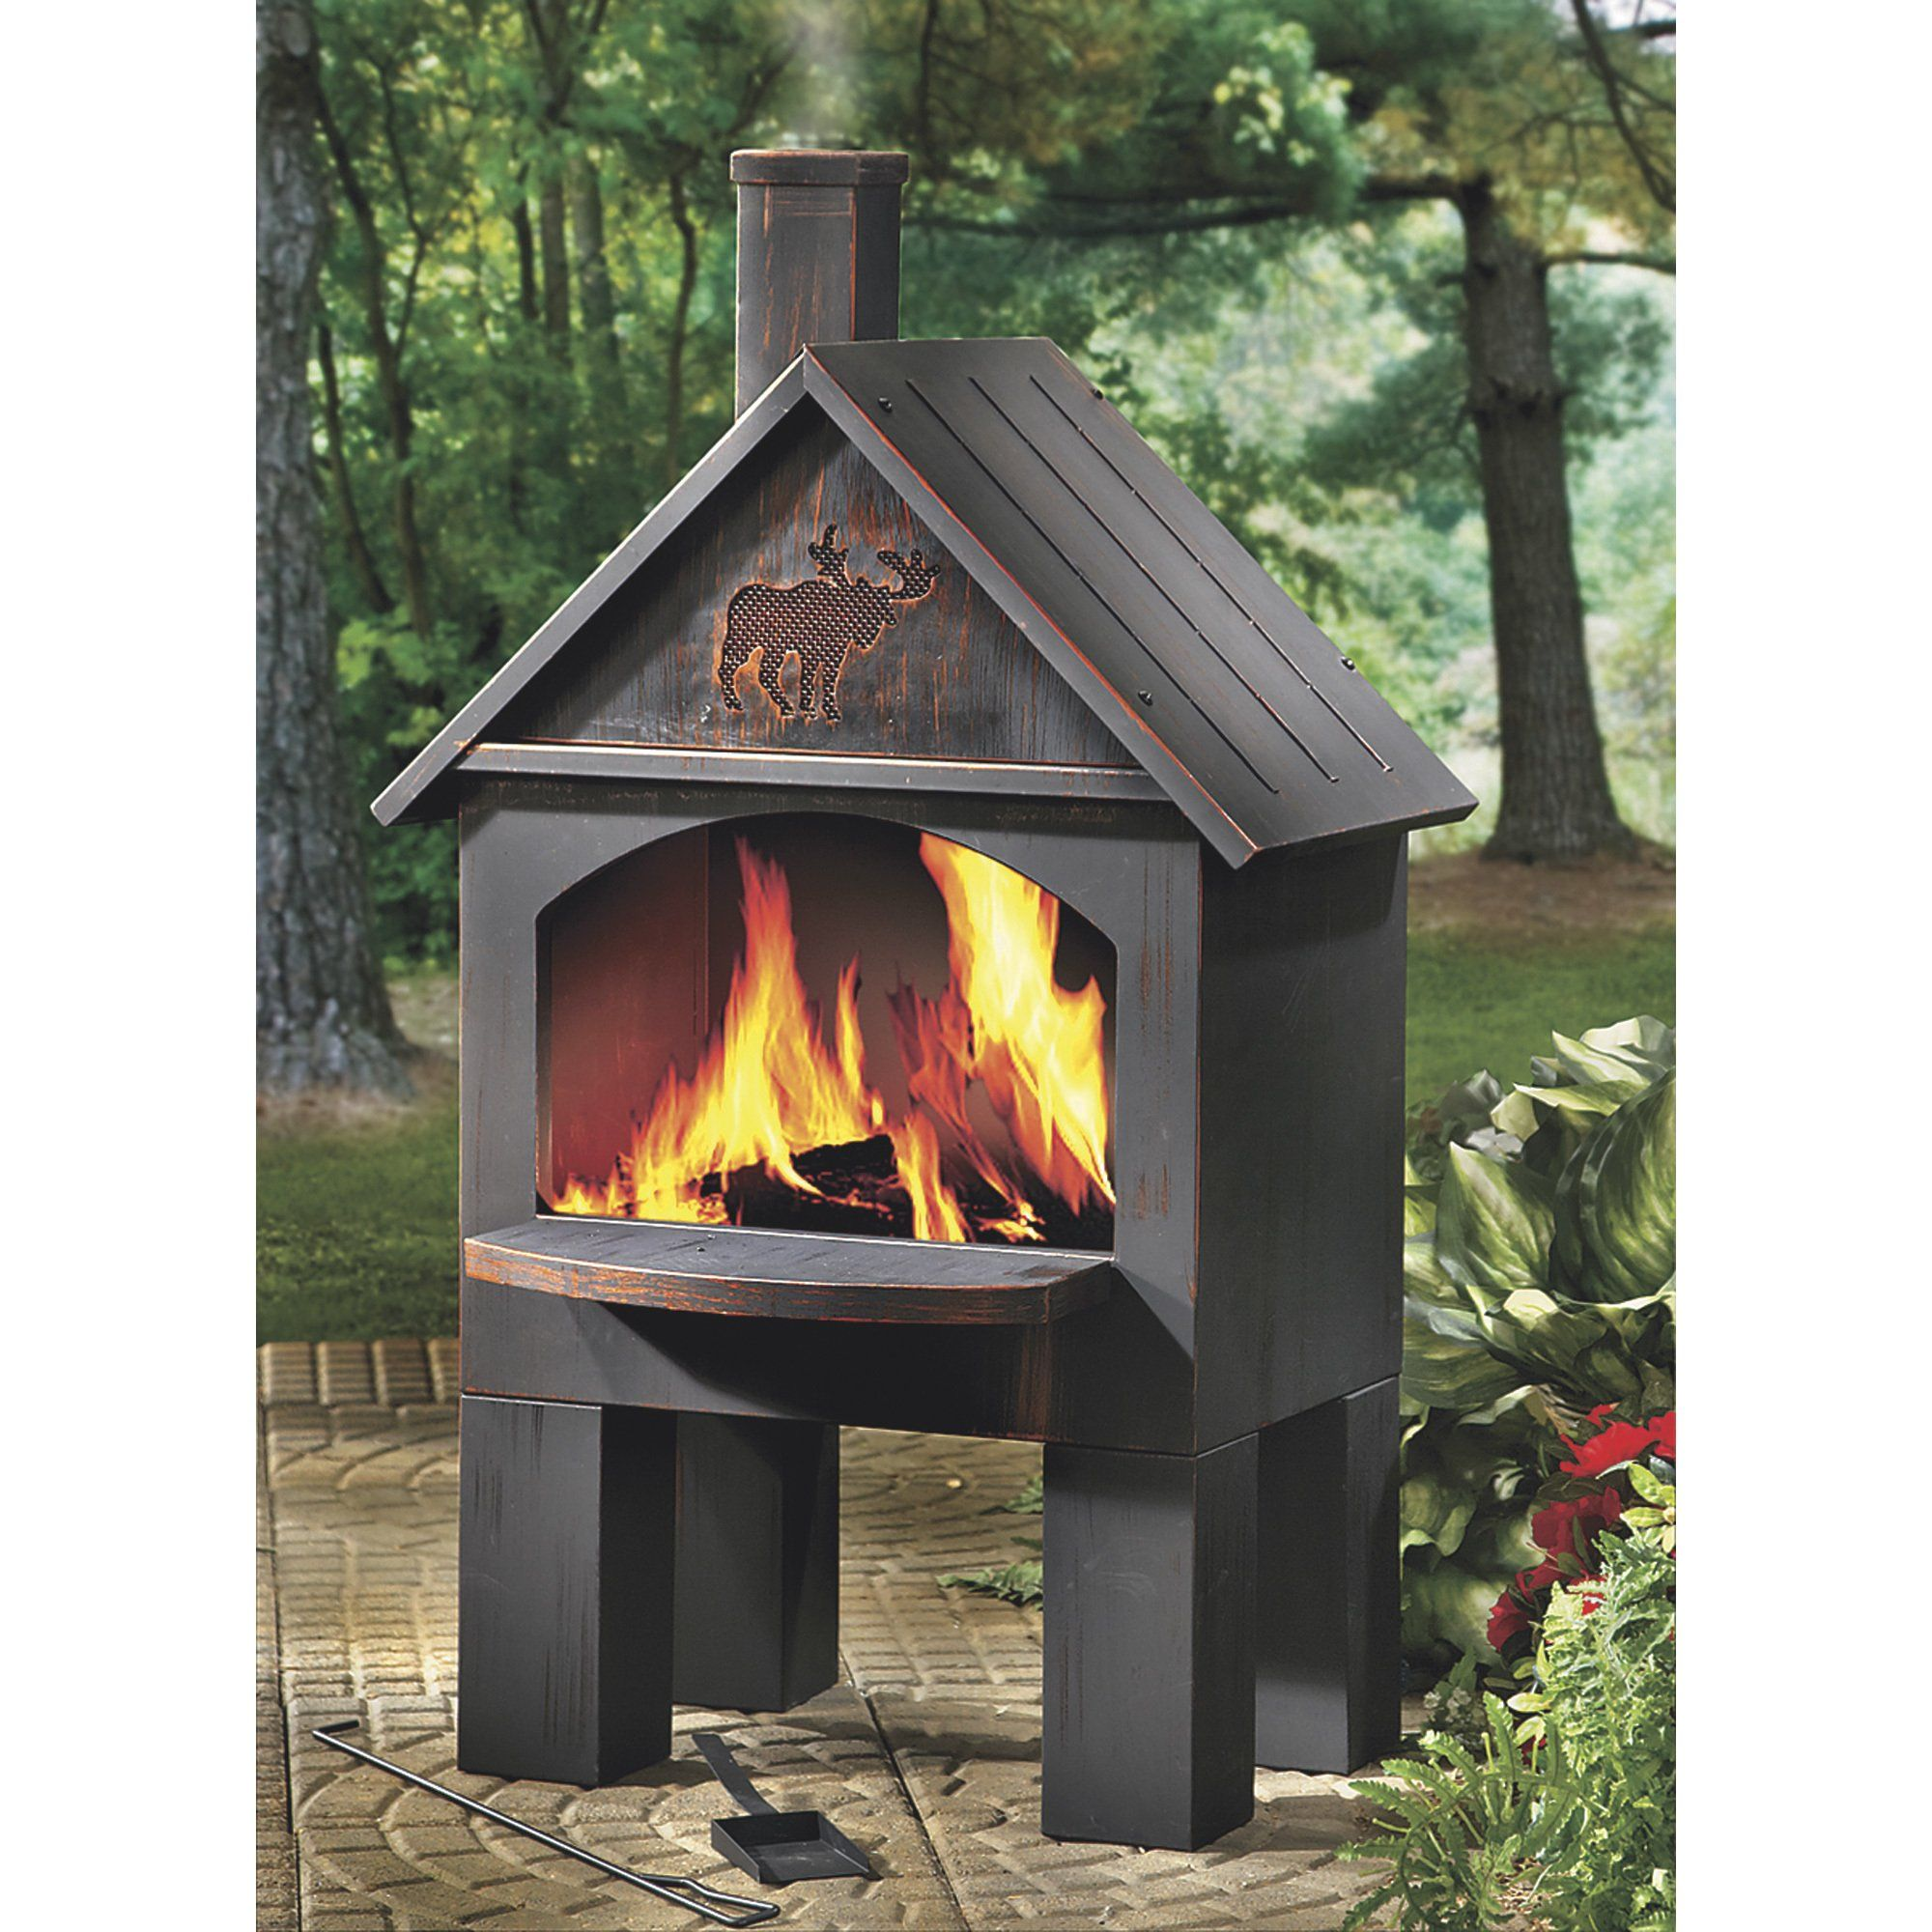 Cabin Style Outdoor Cooking Steel Chiminea 20in W X 25in D X 43in H In 2020 Fire Pit Patio Fire Pit Backyard Deck Fire Pit